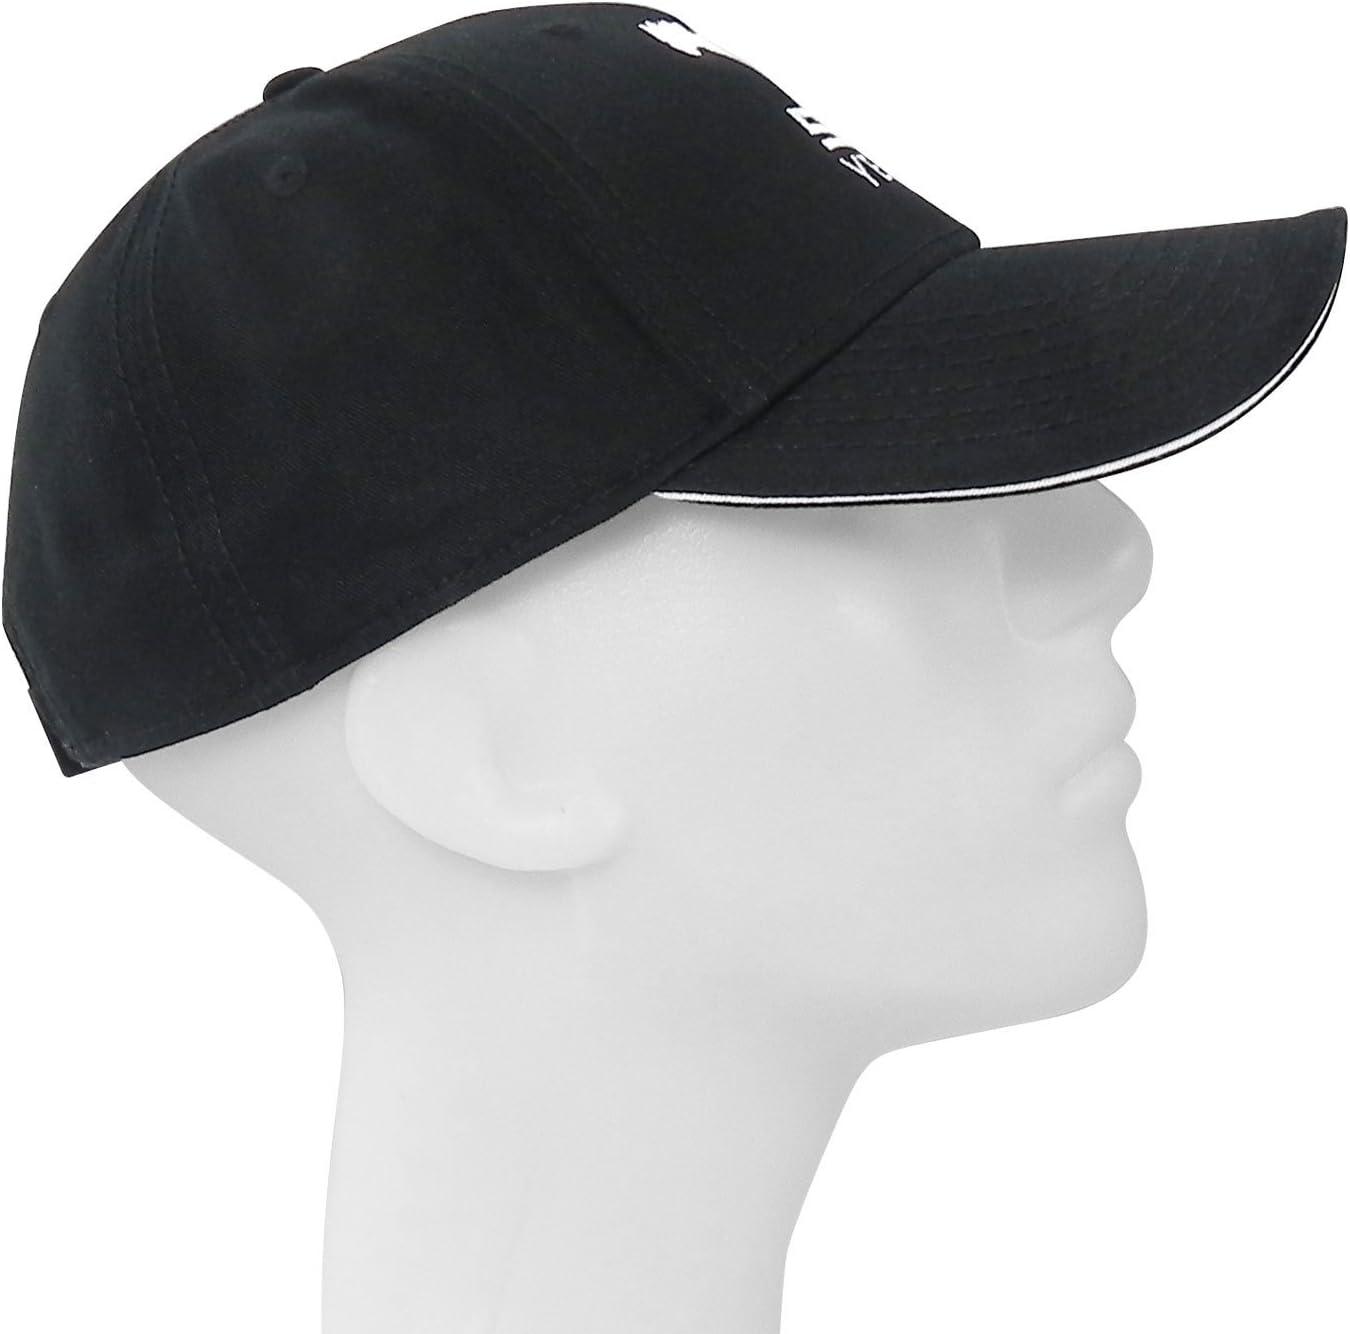 Ford Mustang 50th Anniversary Black Baseball Cap